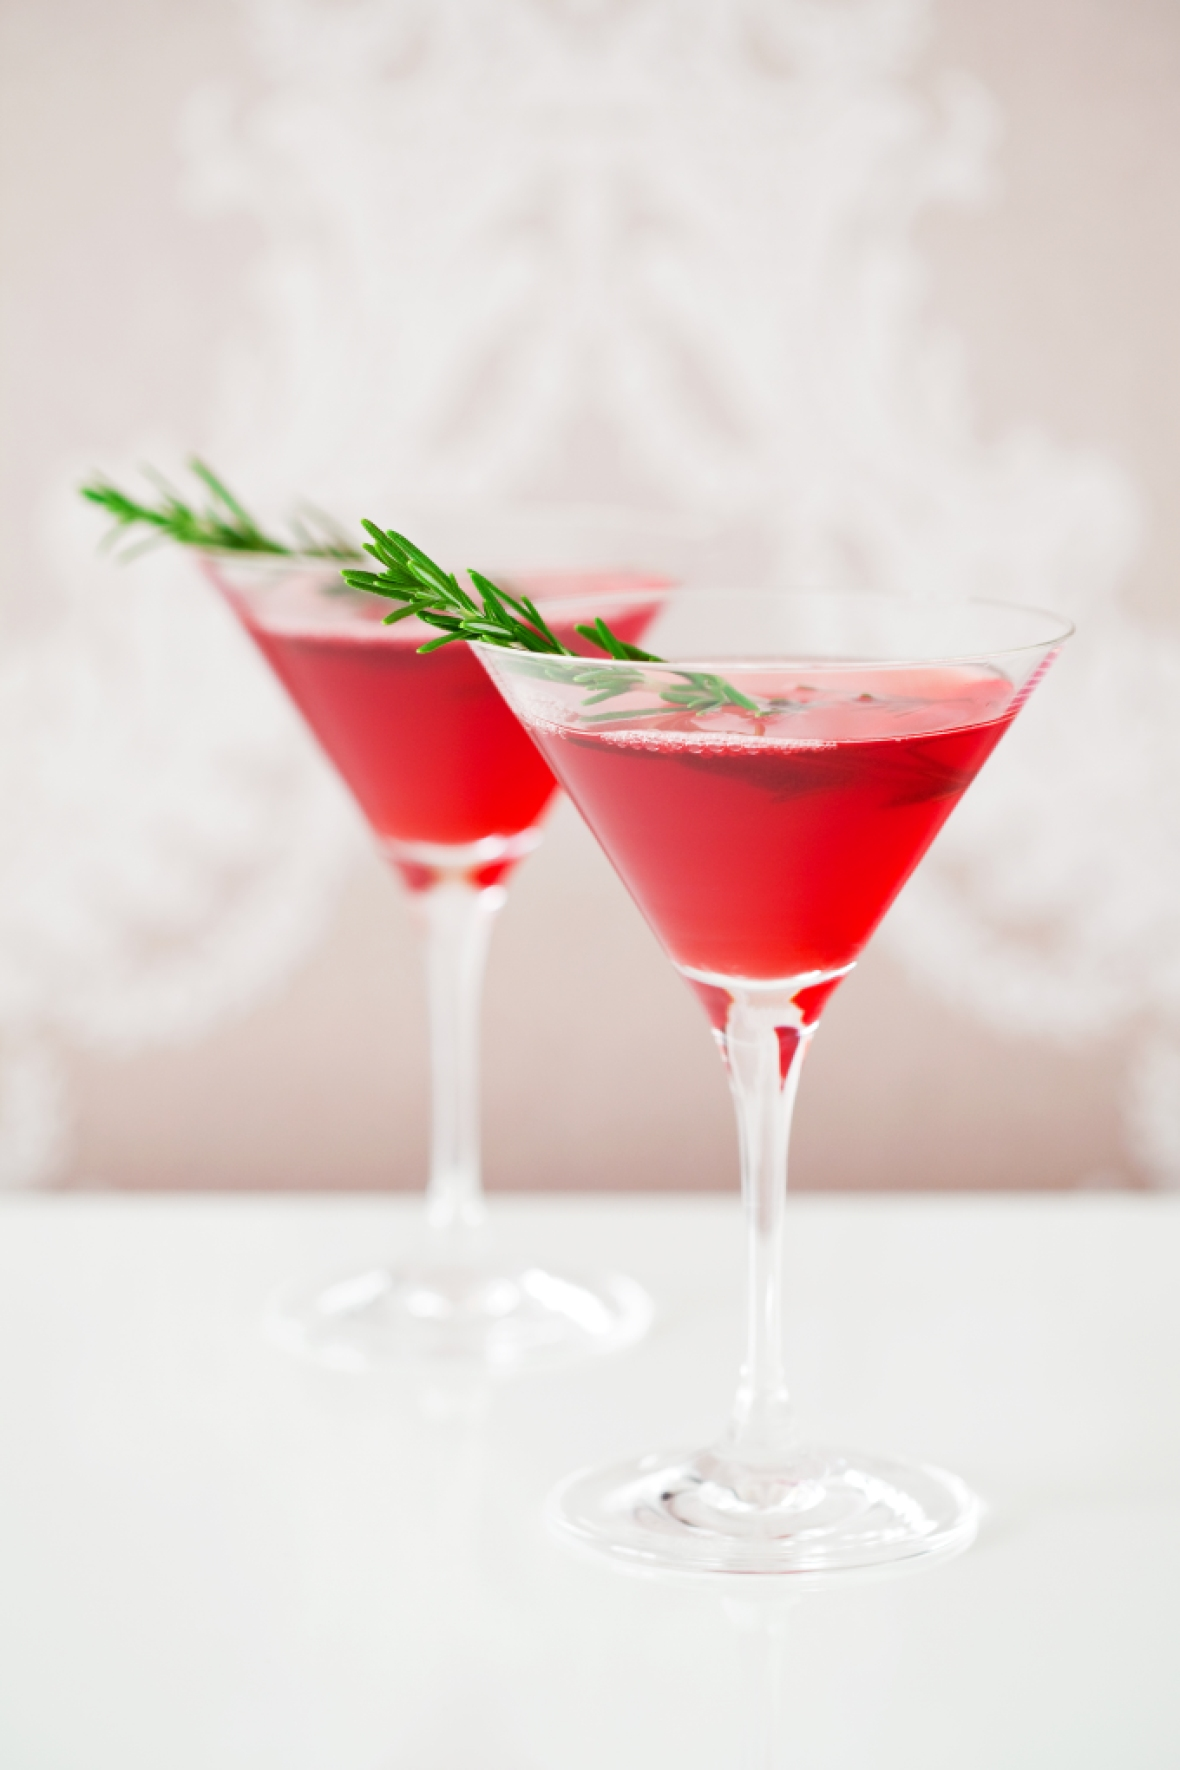 gin and cranberry recipe